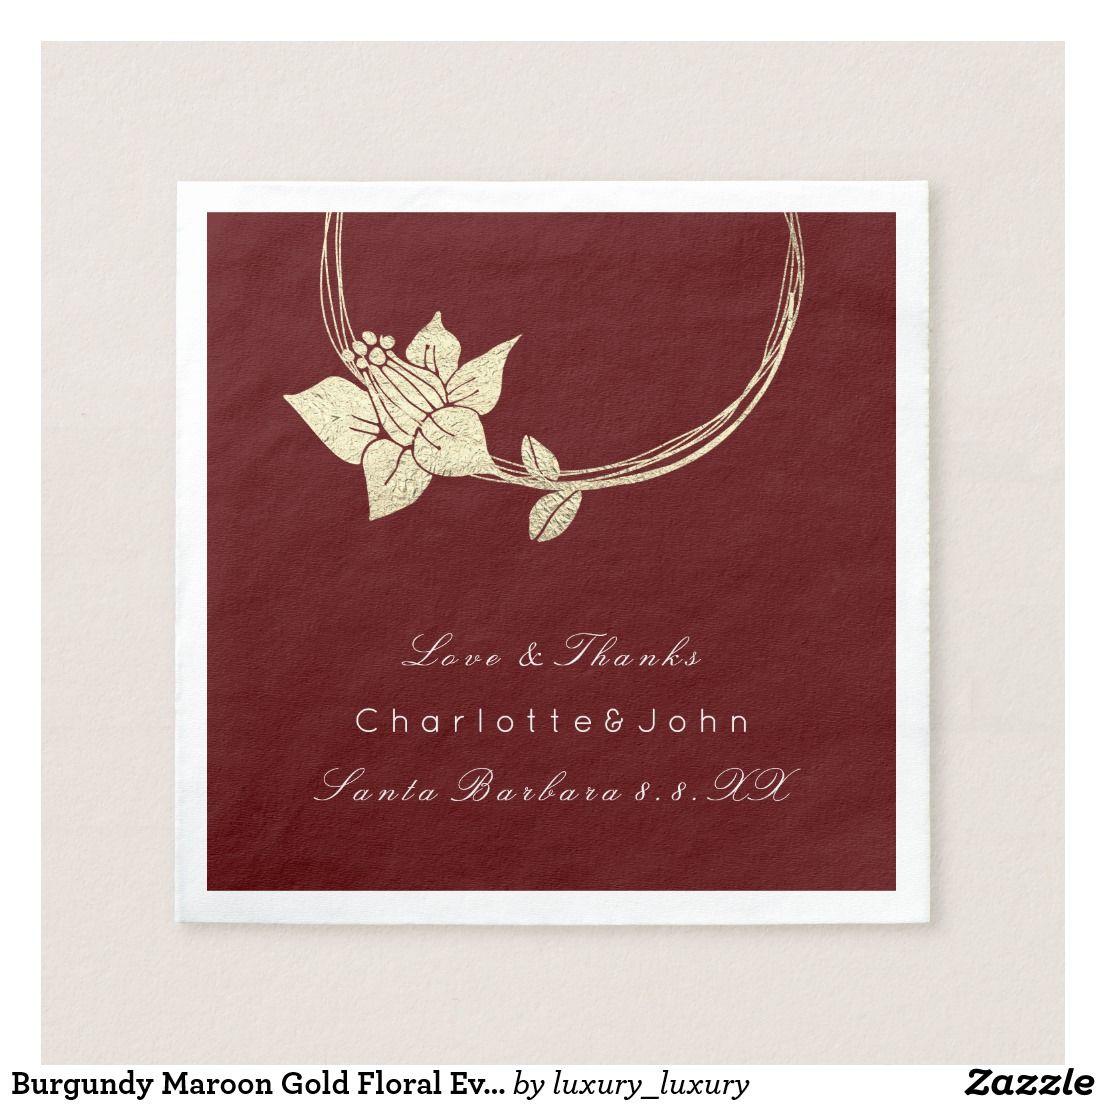 Burgundy Maroon Gold Floral Event Bridal Holidays Napkin